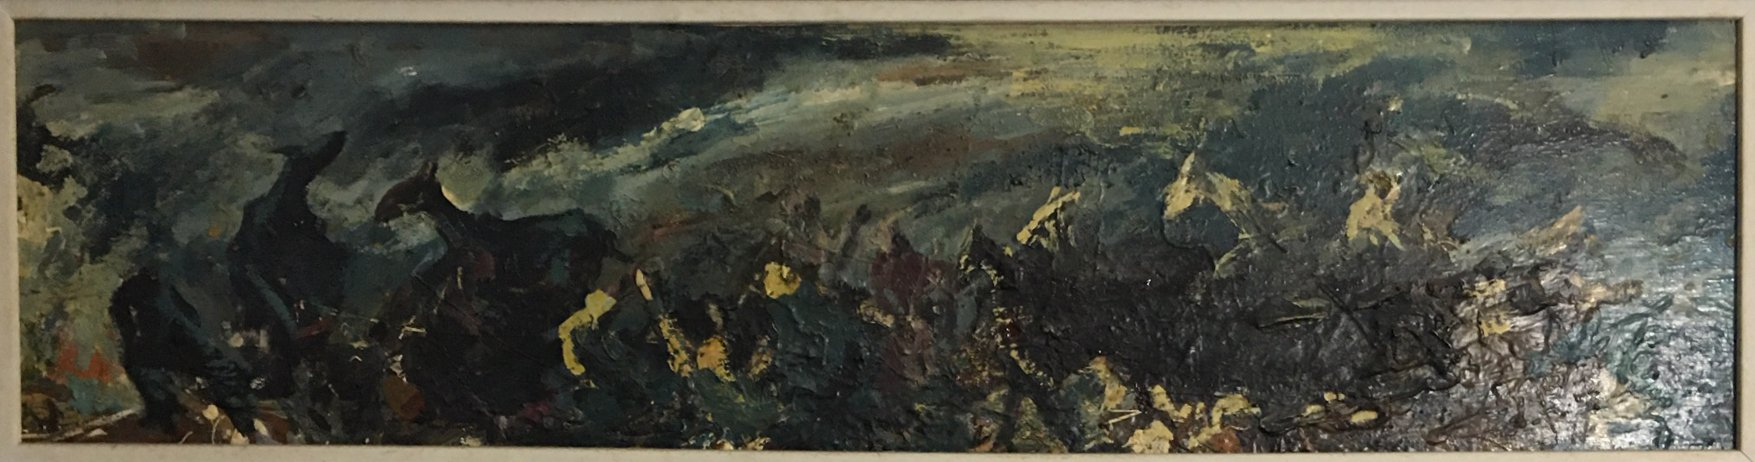 "Epifanio Irizarry: Stampede (undated)Oil on canvas 36"" x 11"""